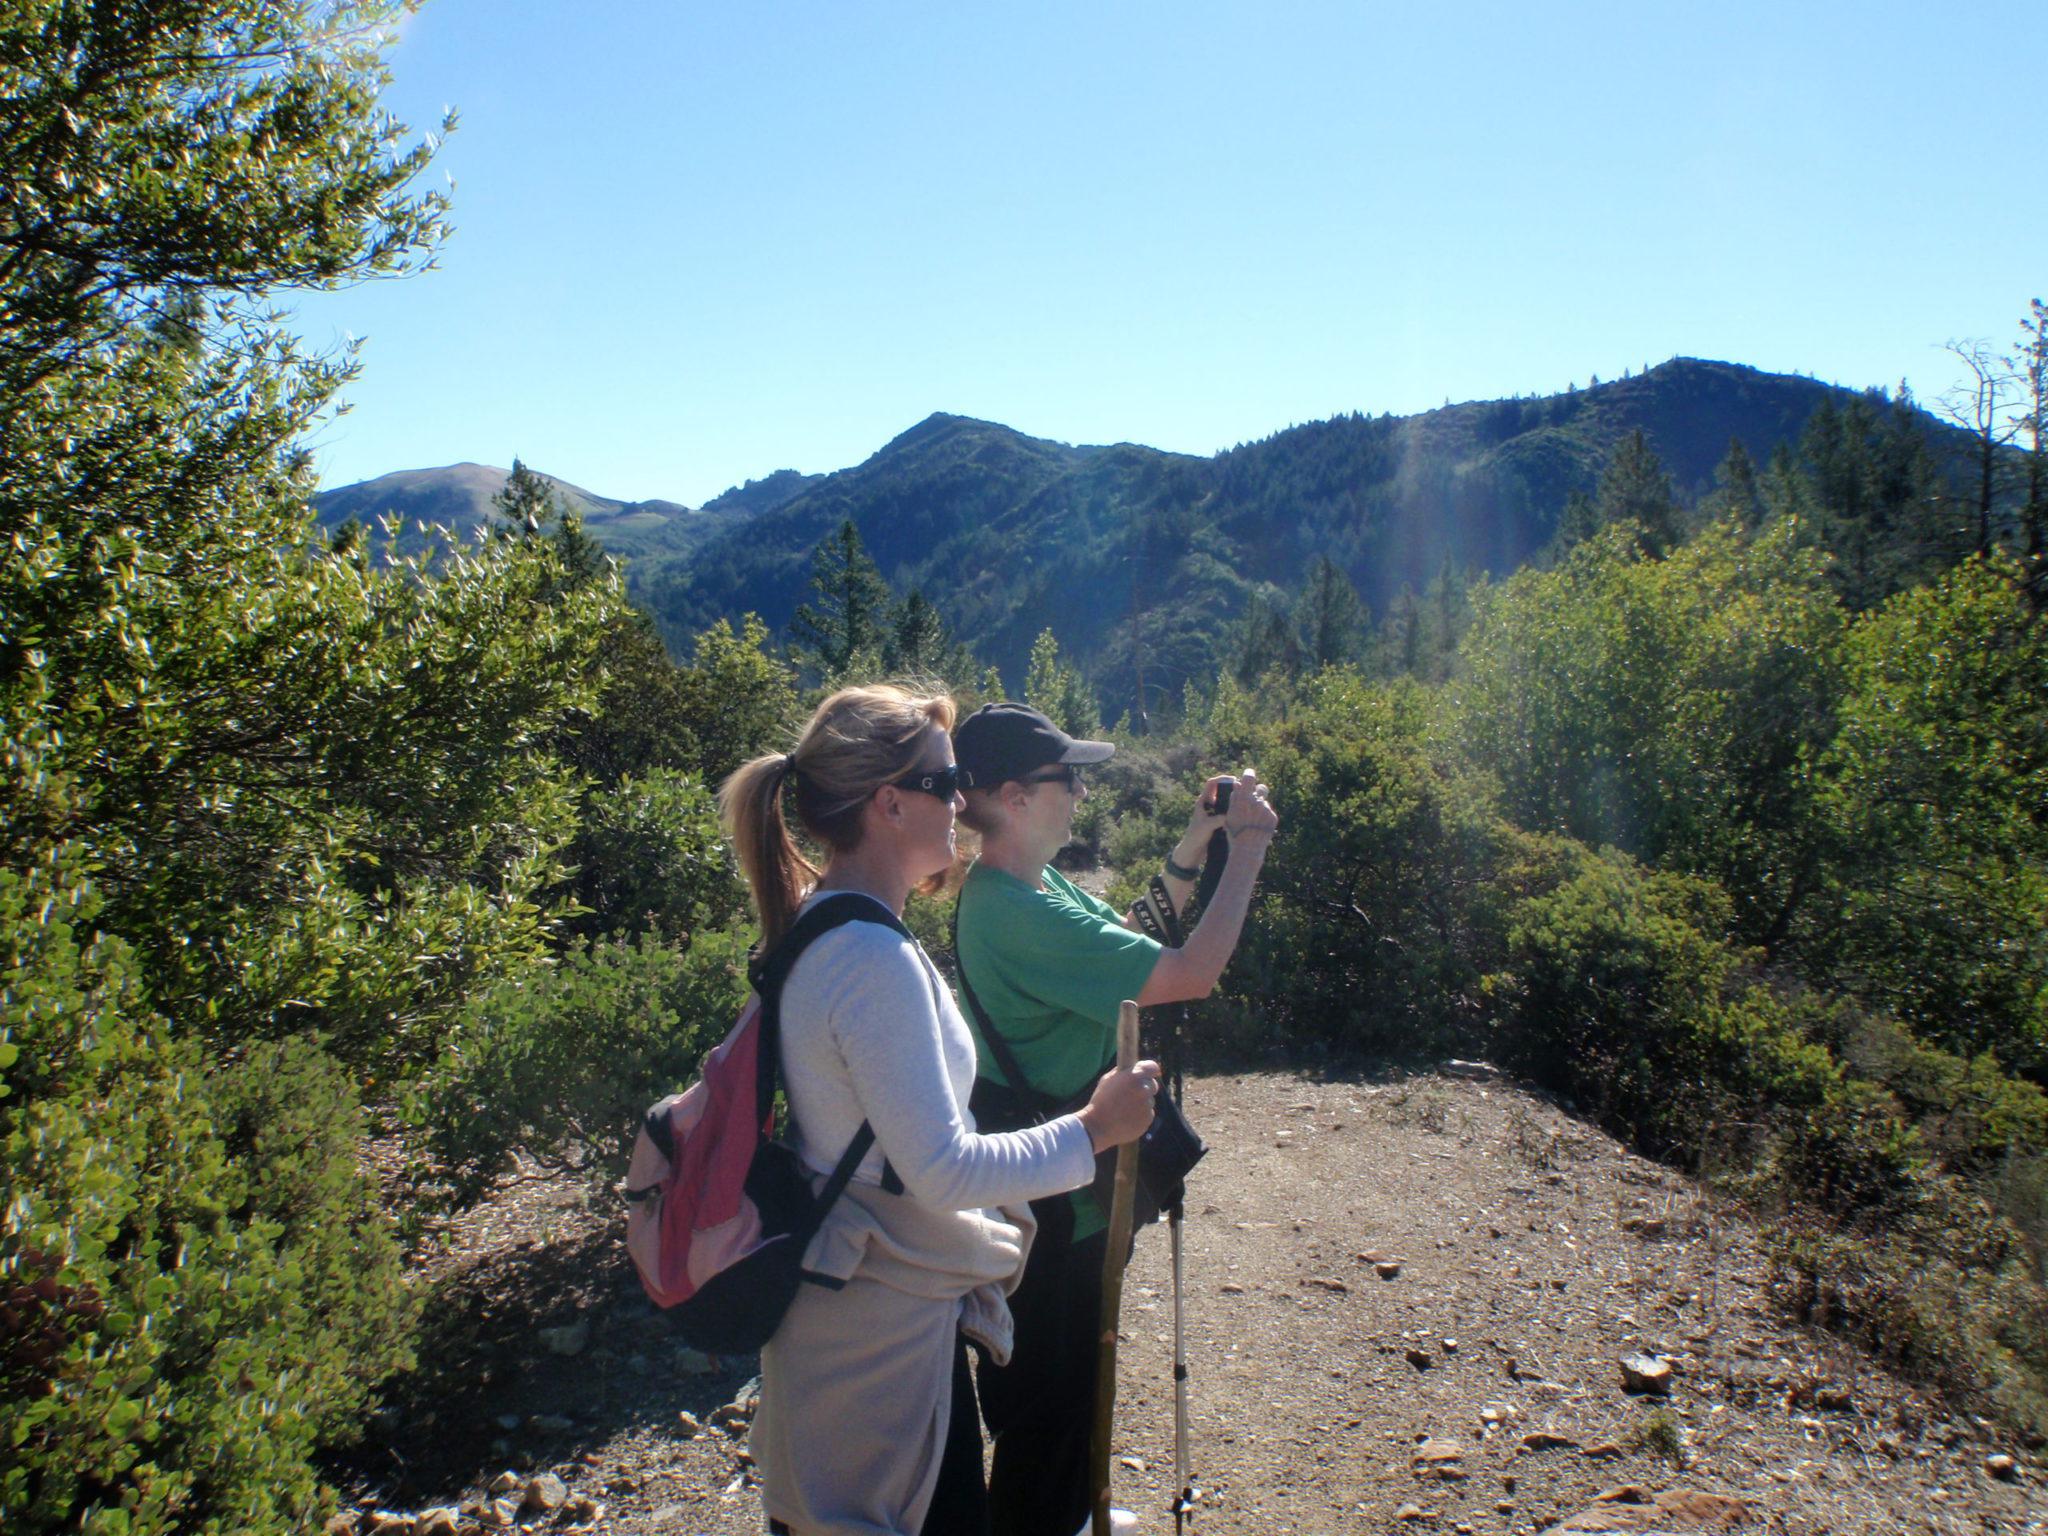 Sonoma Valley hiking trip in California: 5 day inn to inn US hike